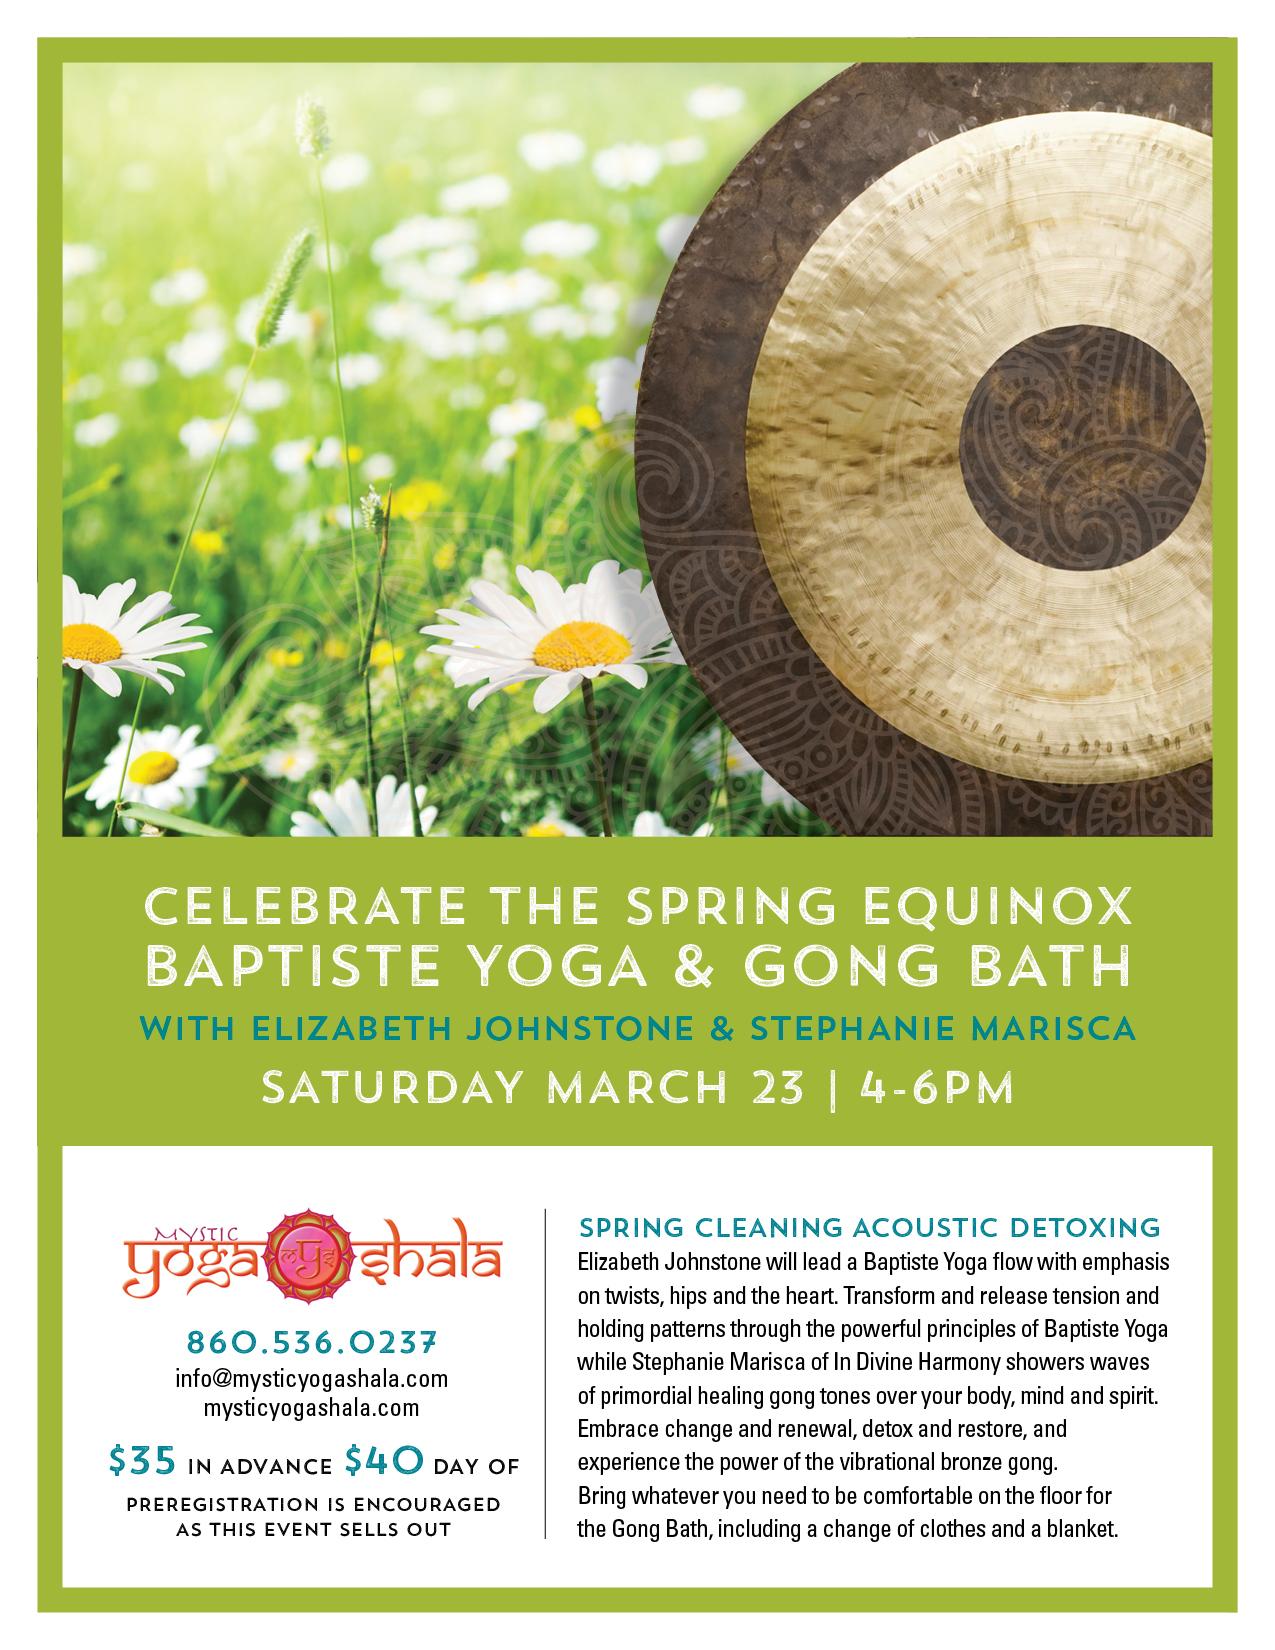 gong_bath_spring_2019.jpg